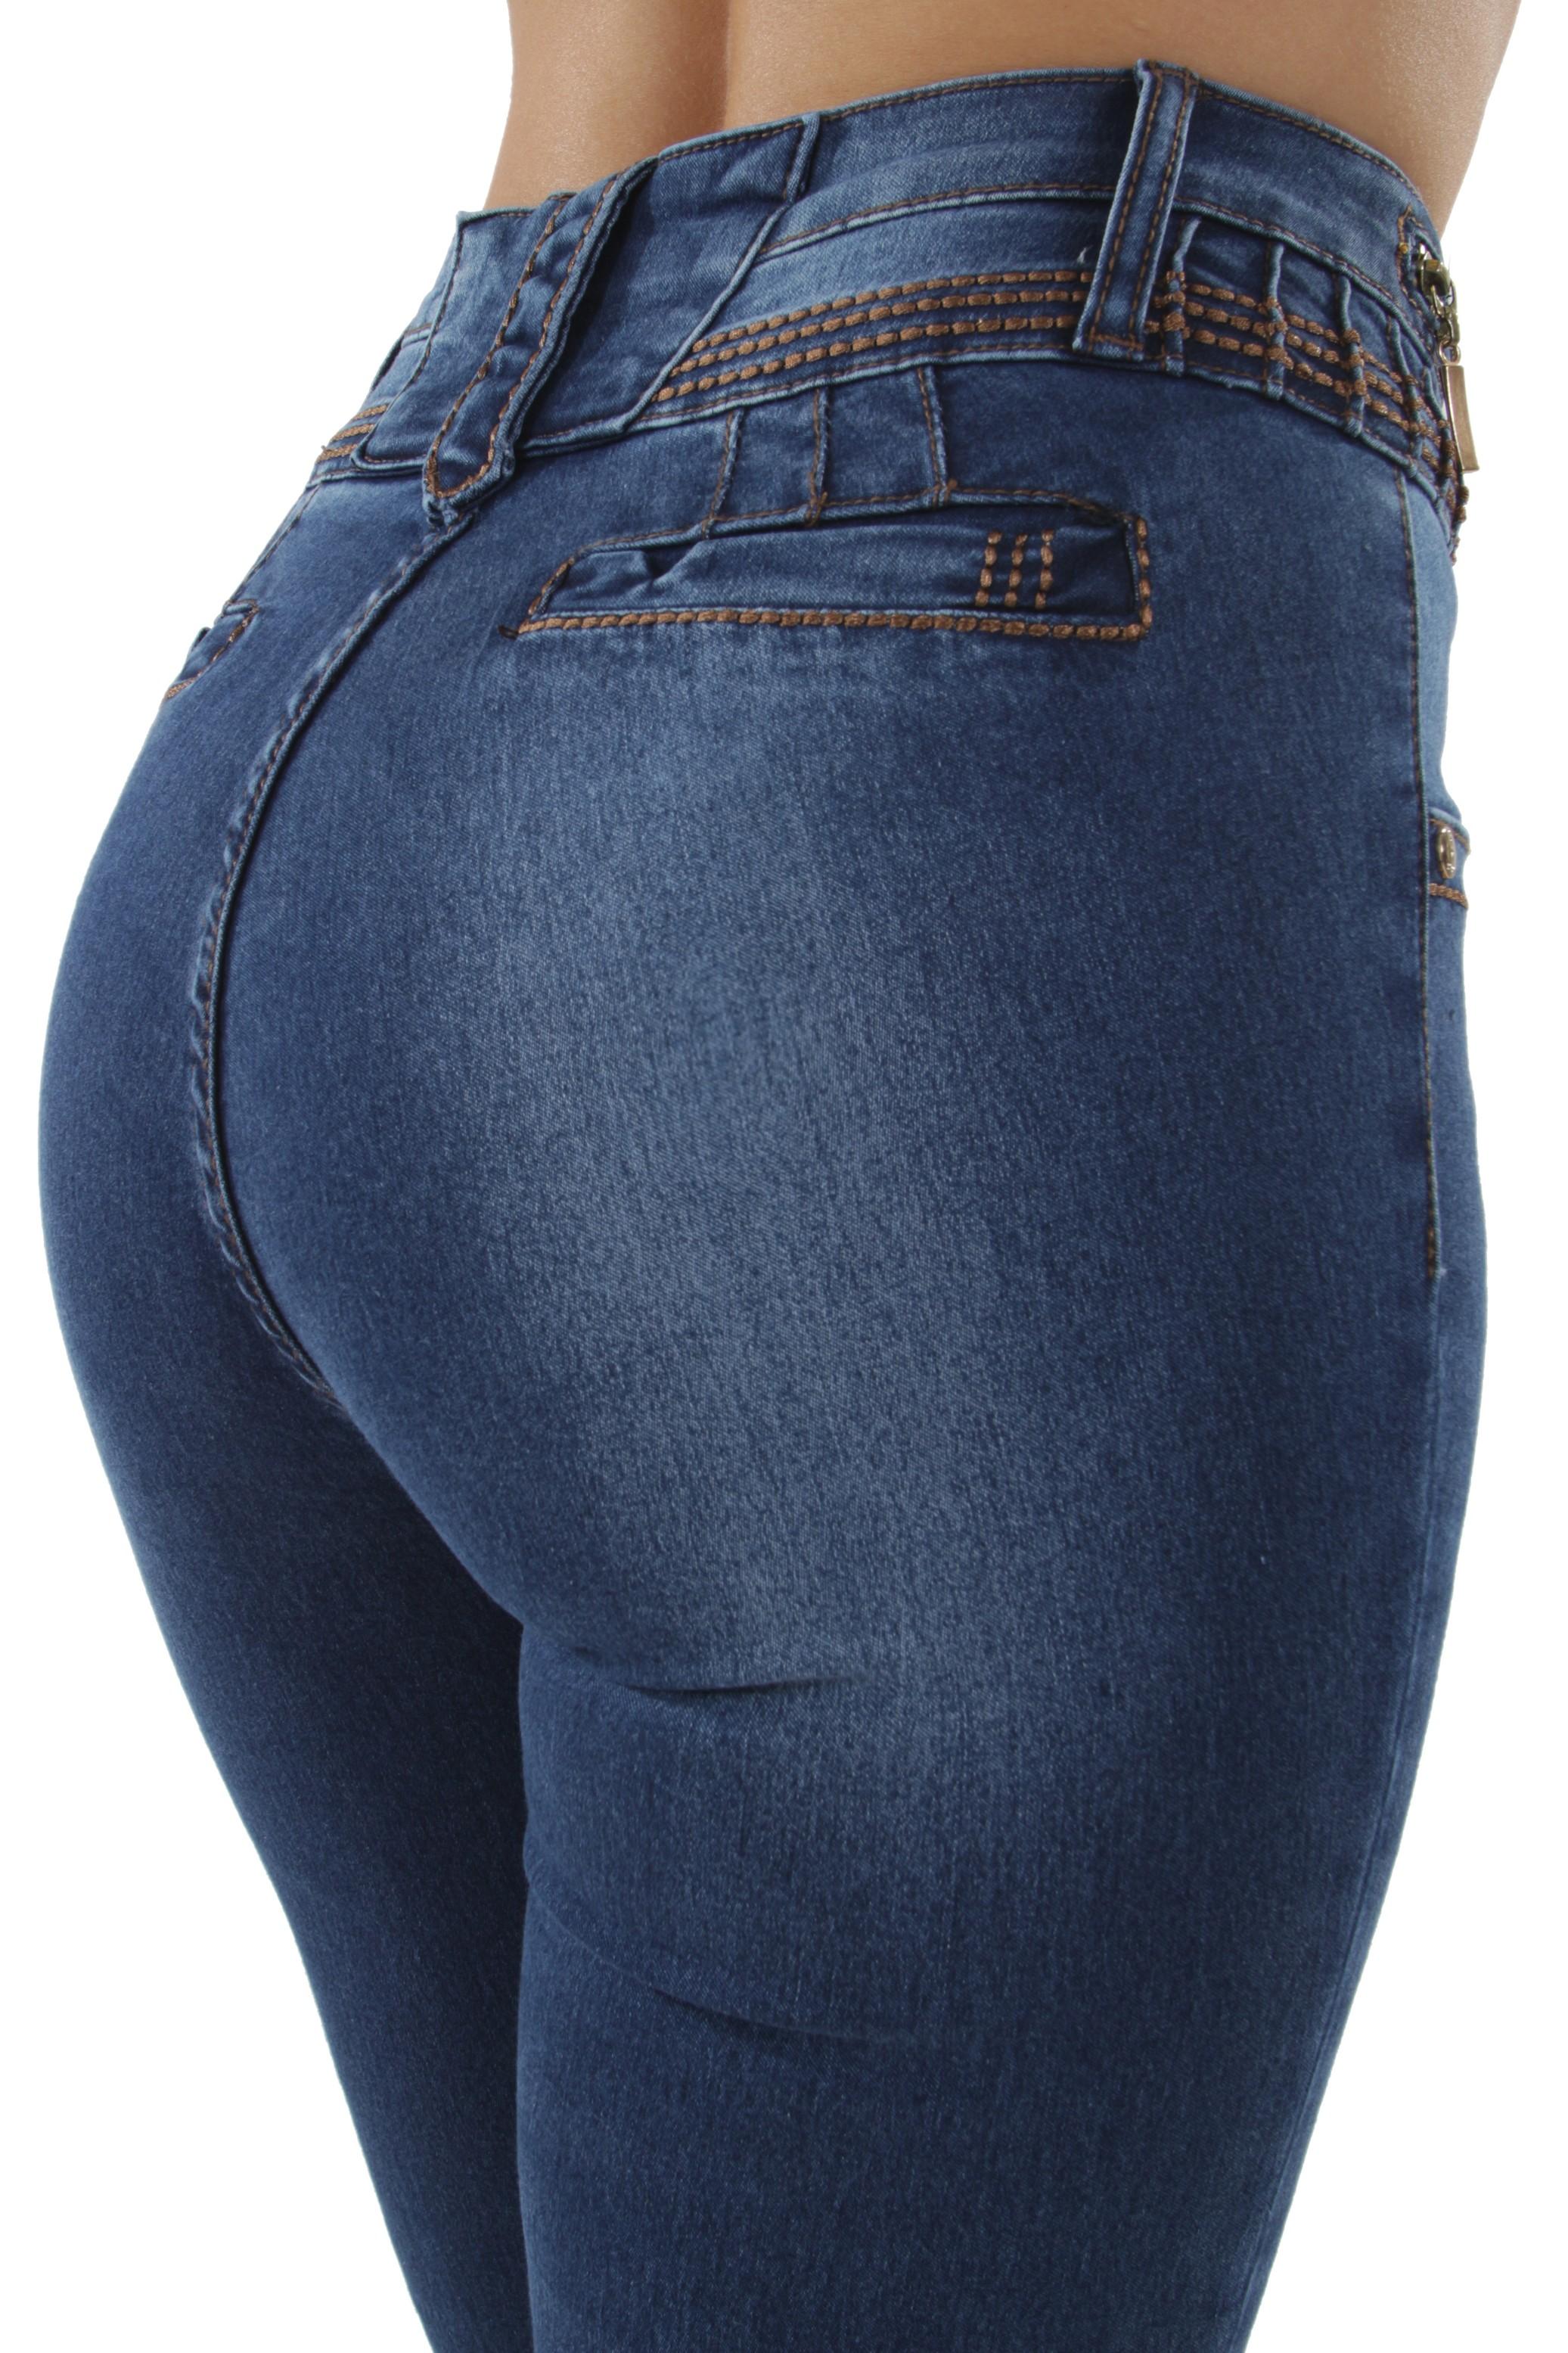 Push Up Skinny Jeans Butt Lift High Waist Colombian Design